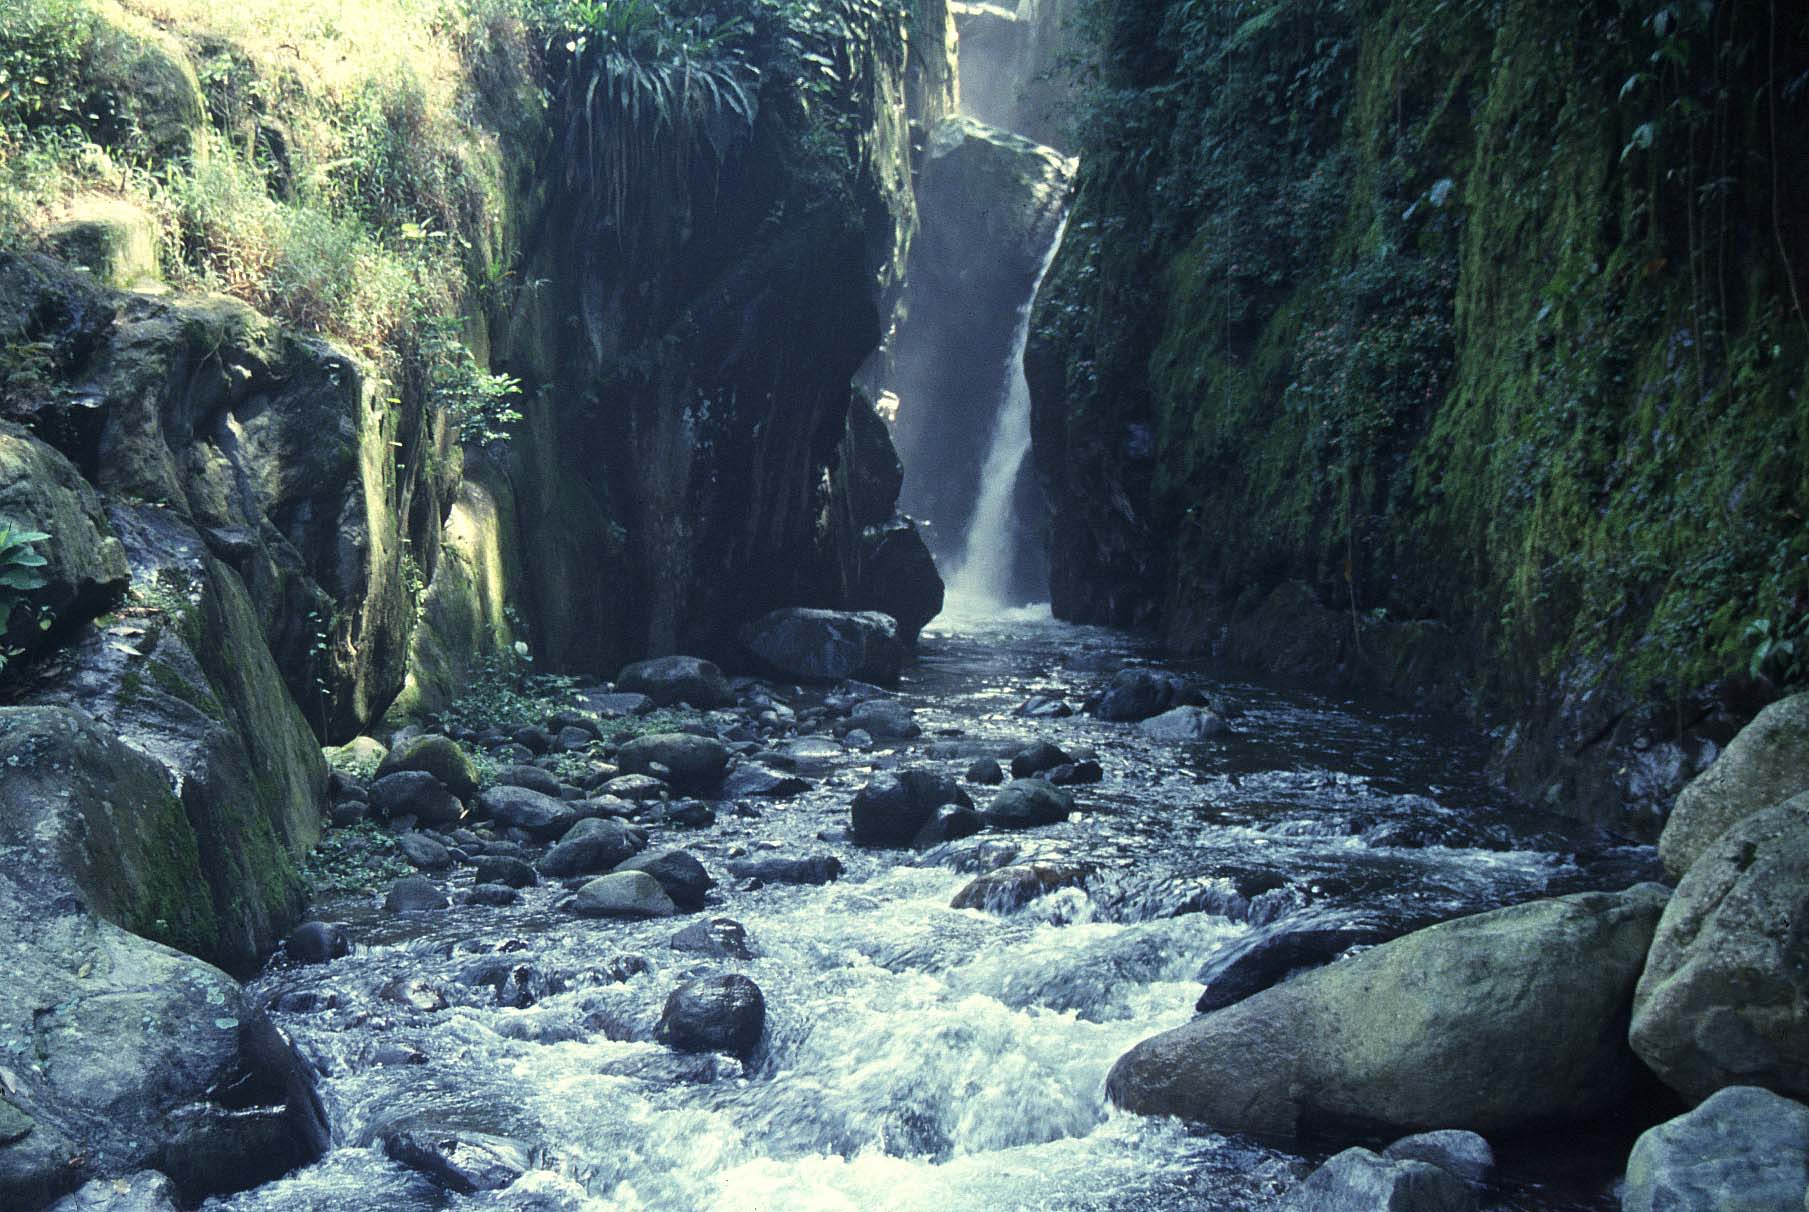 Caídas de agua en la naturaleza. - Página 2 Caida_de_agua_MontePerla